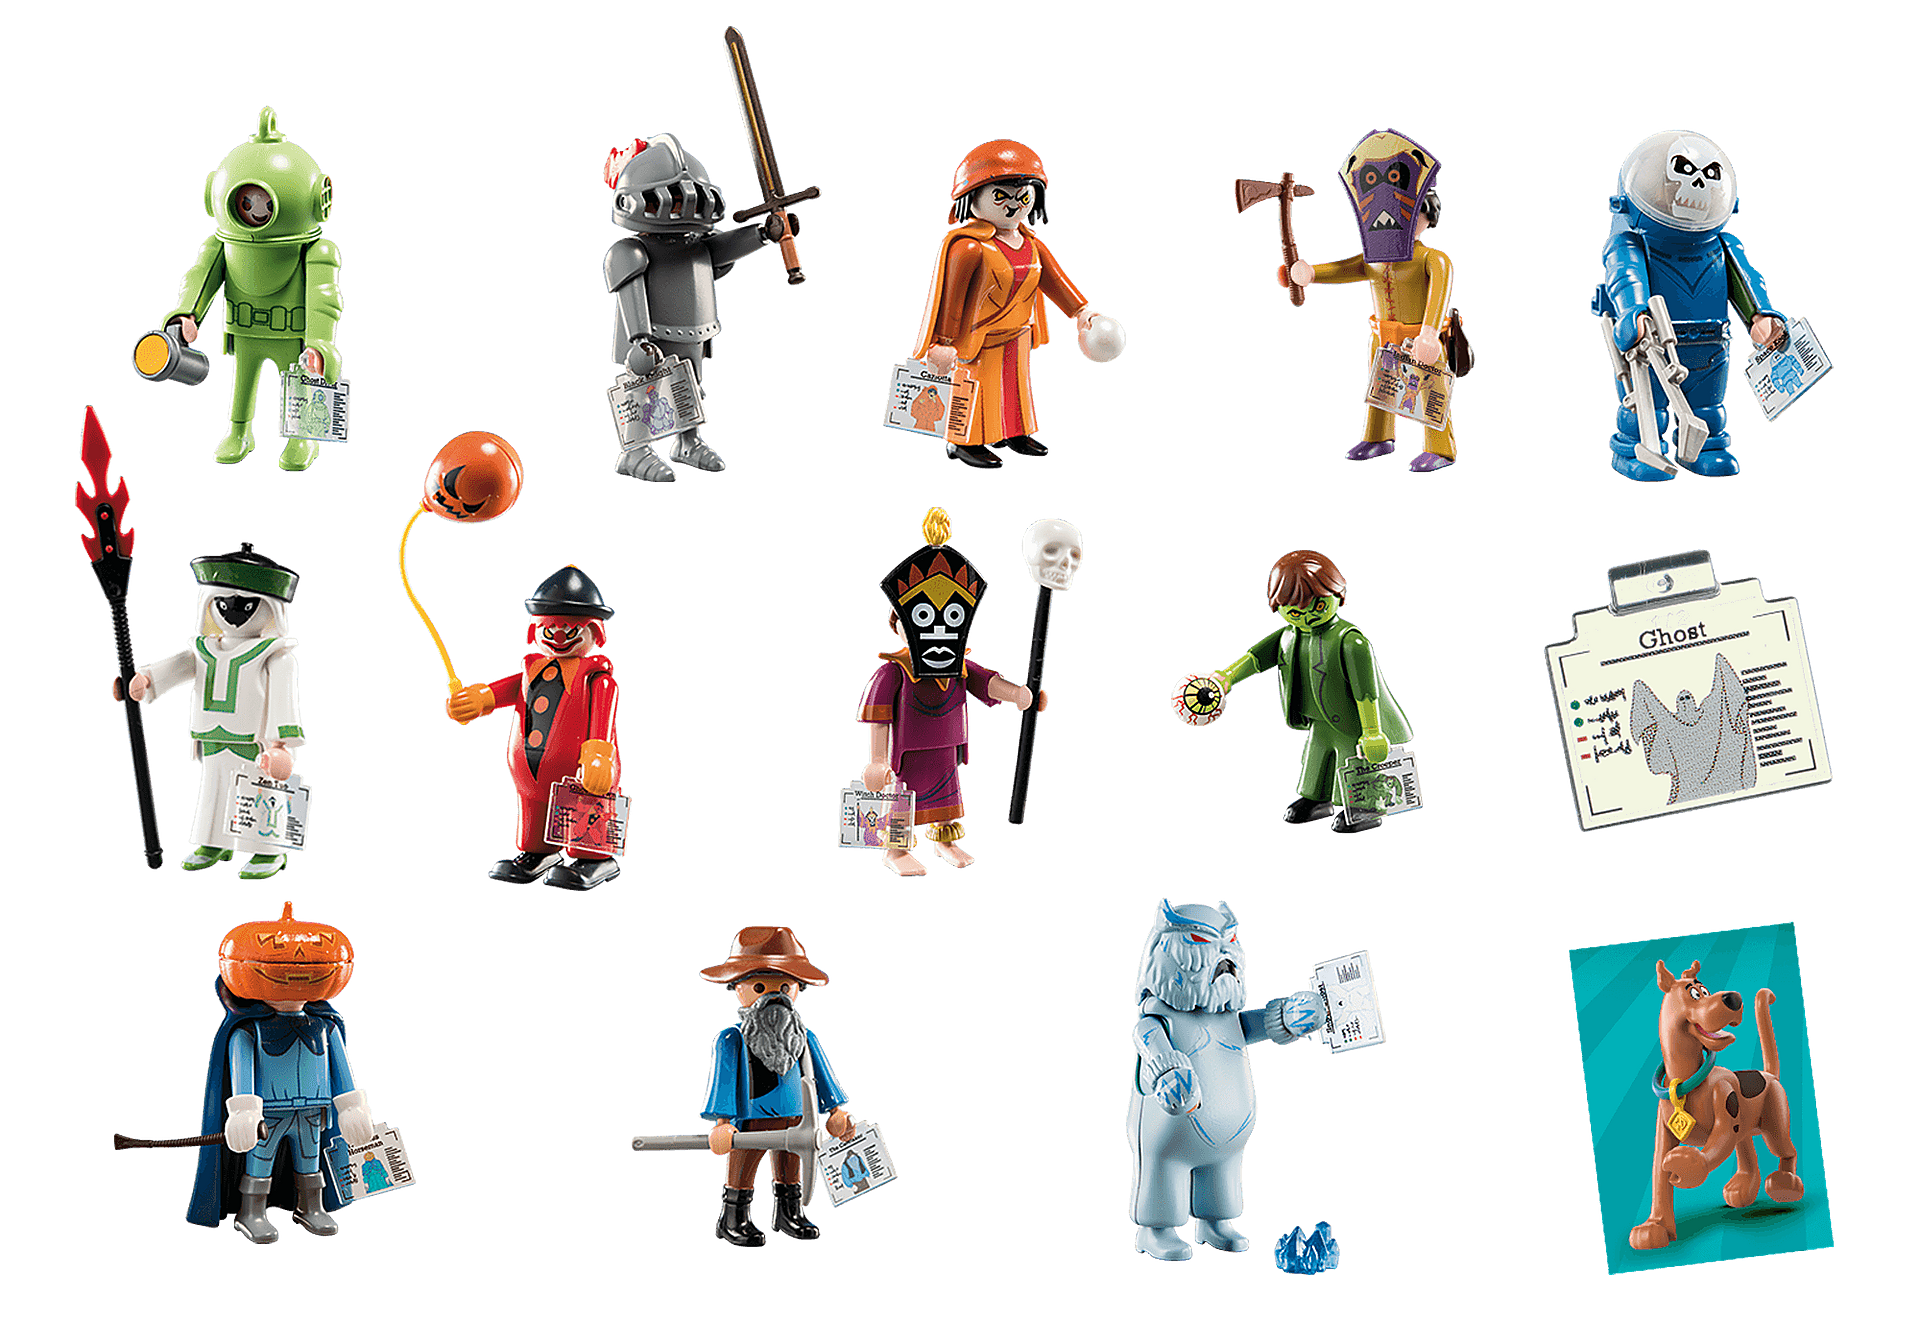 70288 SCOOBY-DOO Figuras Misterio (Series 1) zoom image3